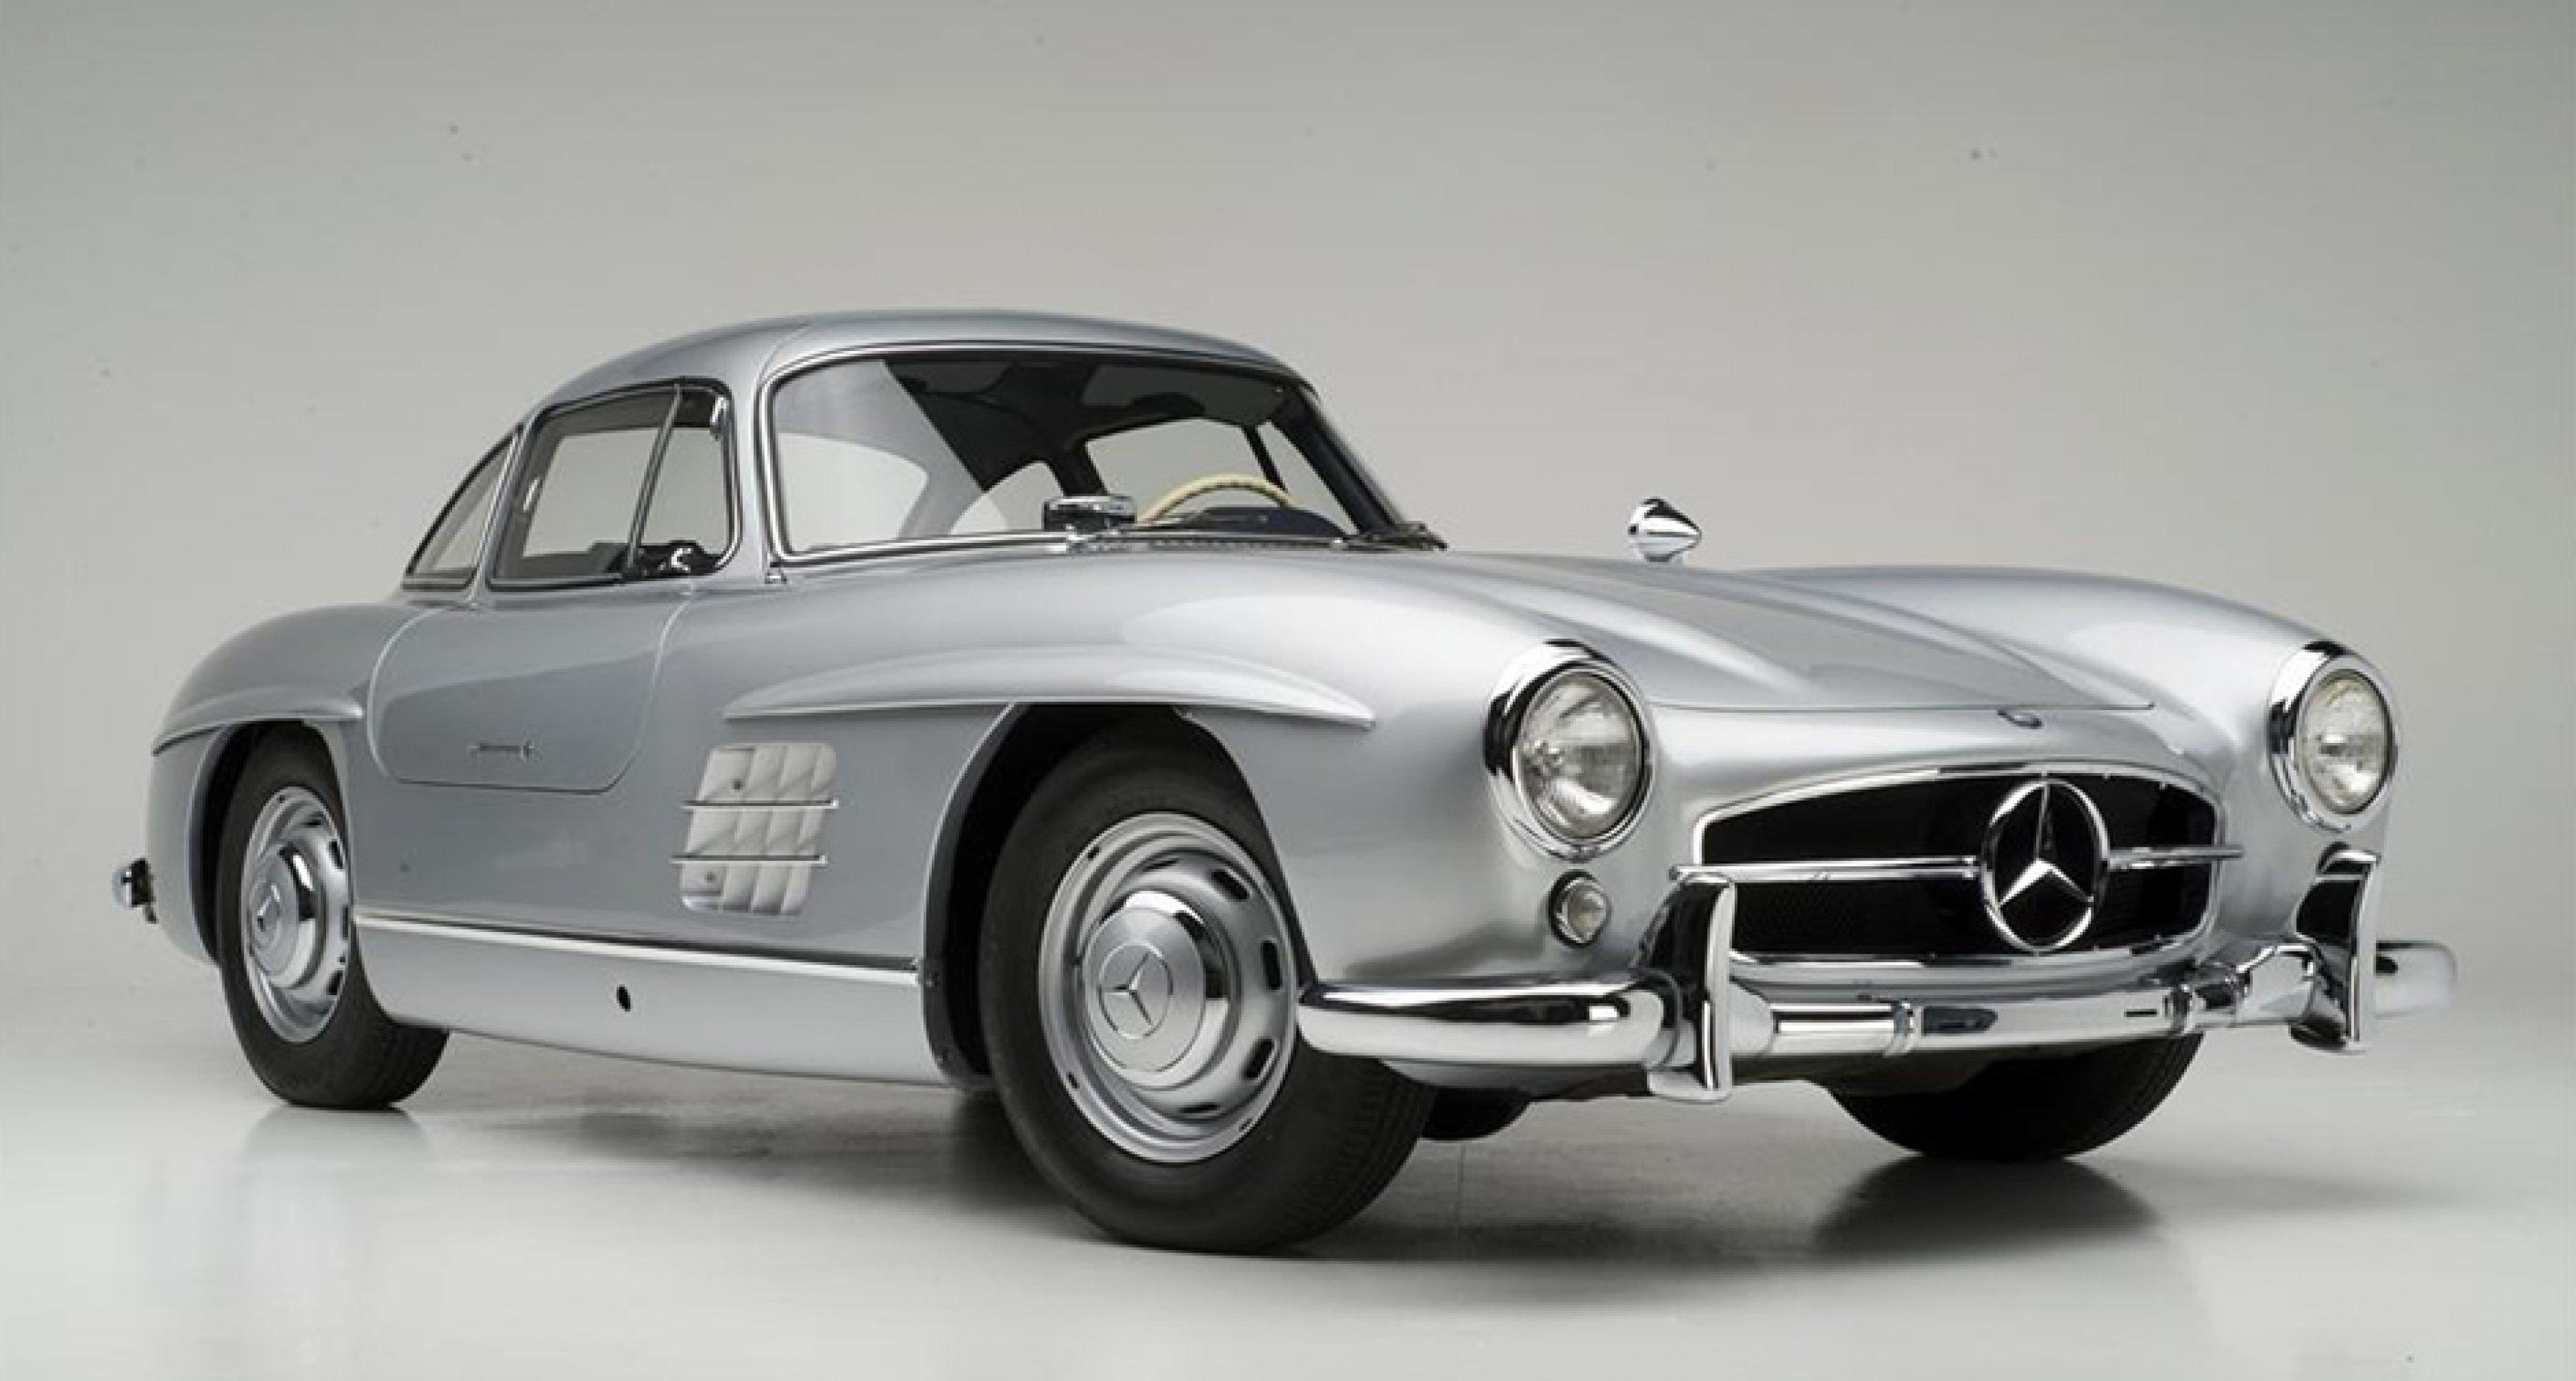 1955 Mercedes-Benz 300SL Gullwing / Schätzpreis nicht angegeben (Lot 5044)